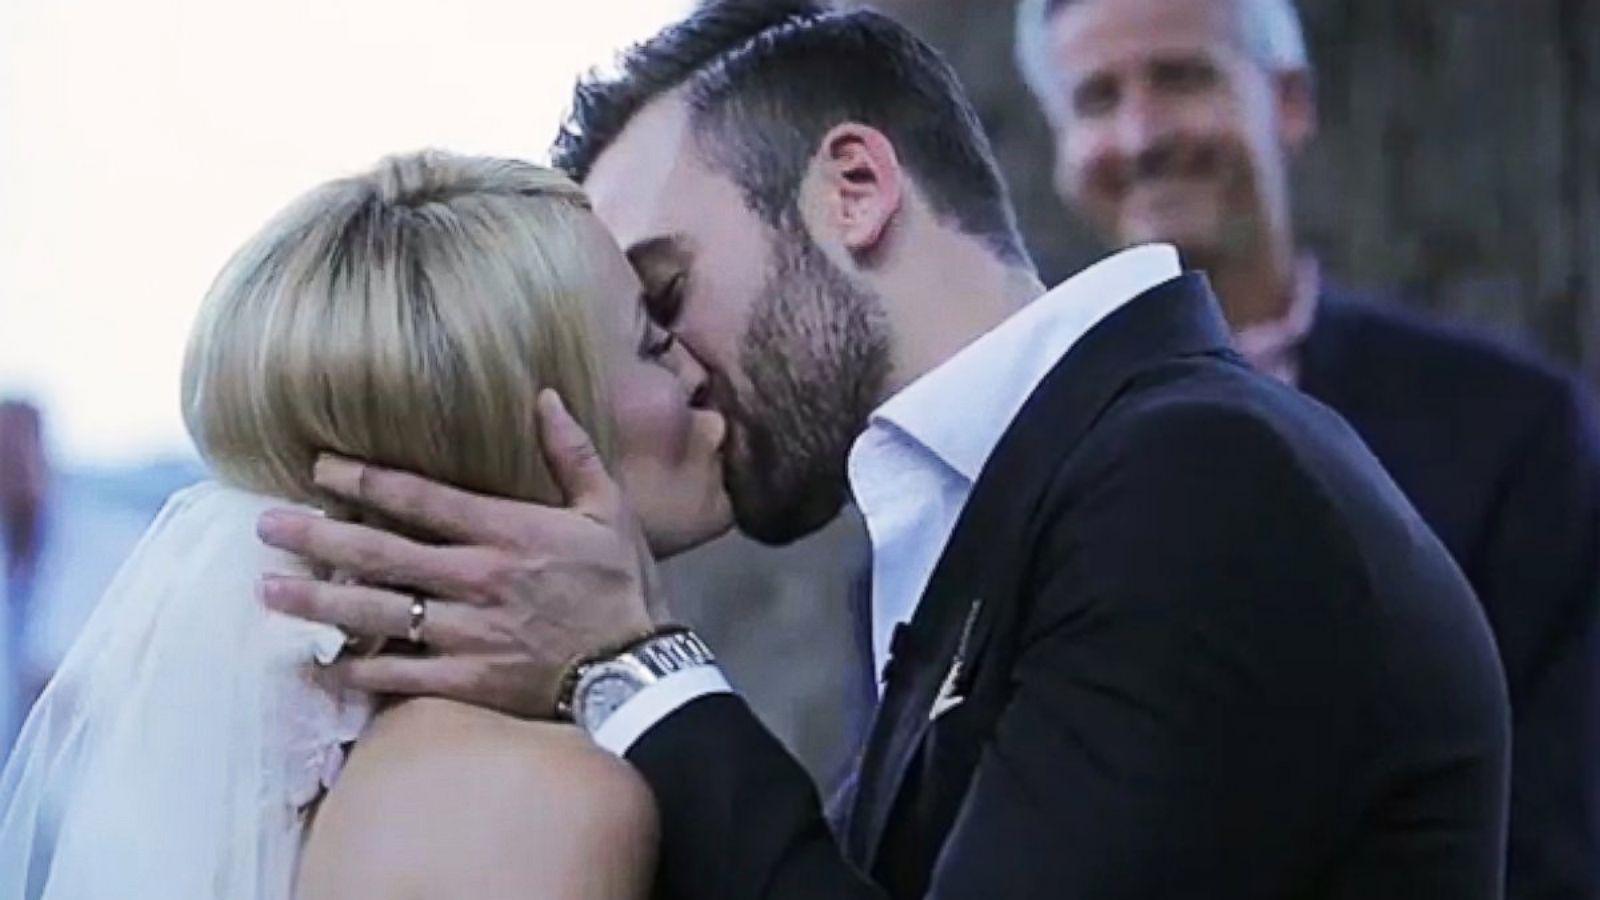 Former Bachelorette Emily Maynard Shares Her Sweet Wedding Video Abc News